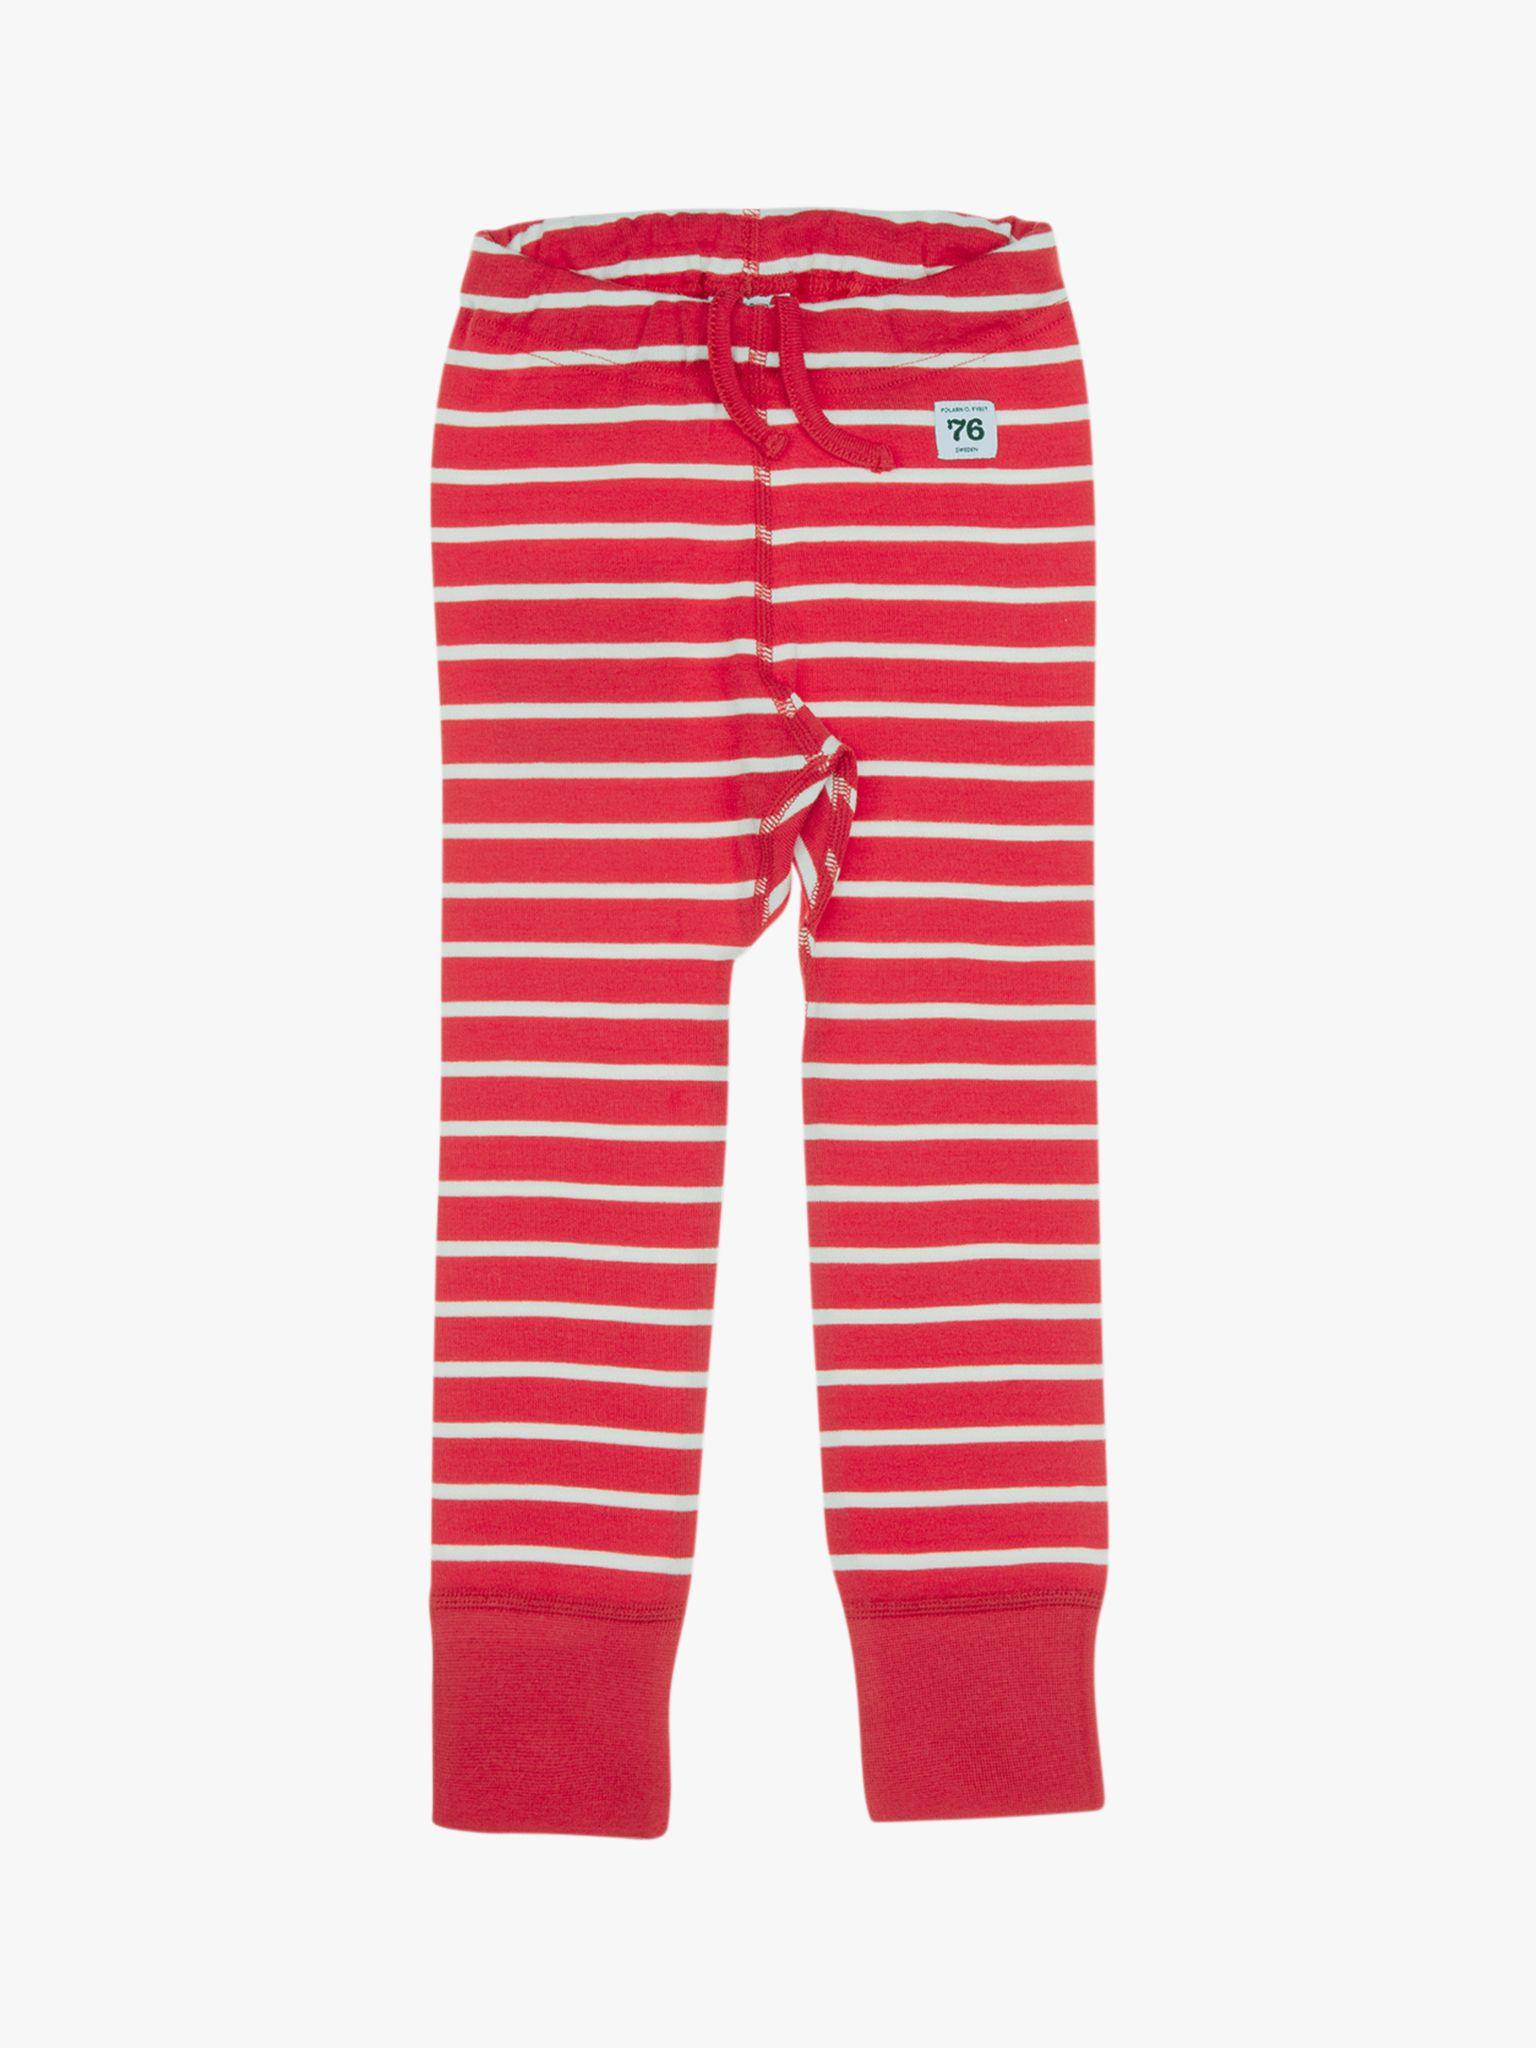 Polarn O. Pyret Polarn O. Pyret Children's GOTS Organic Cotton Stripe Leggings